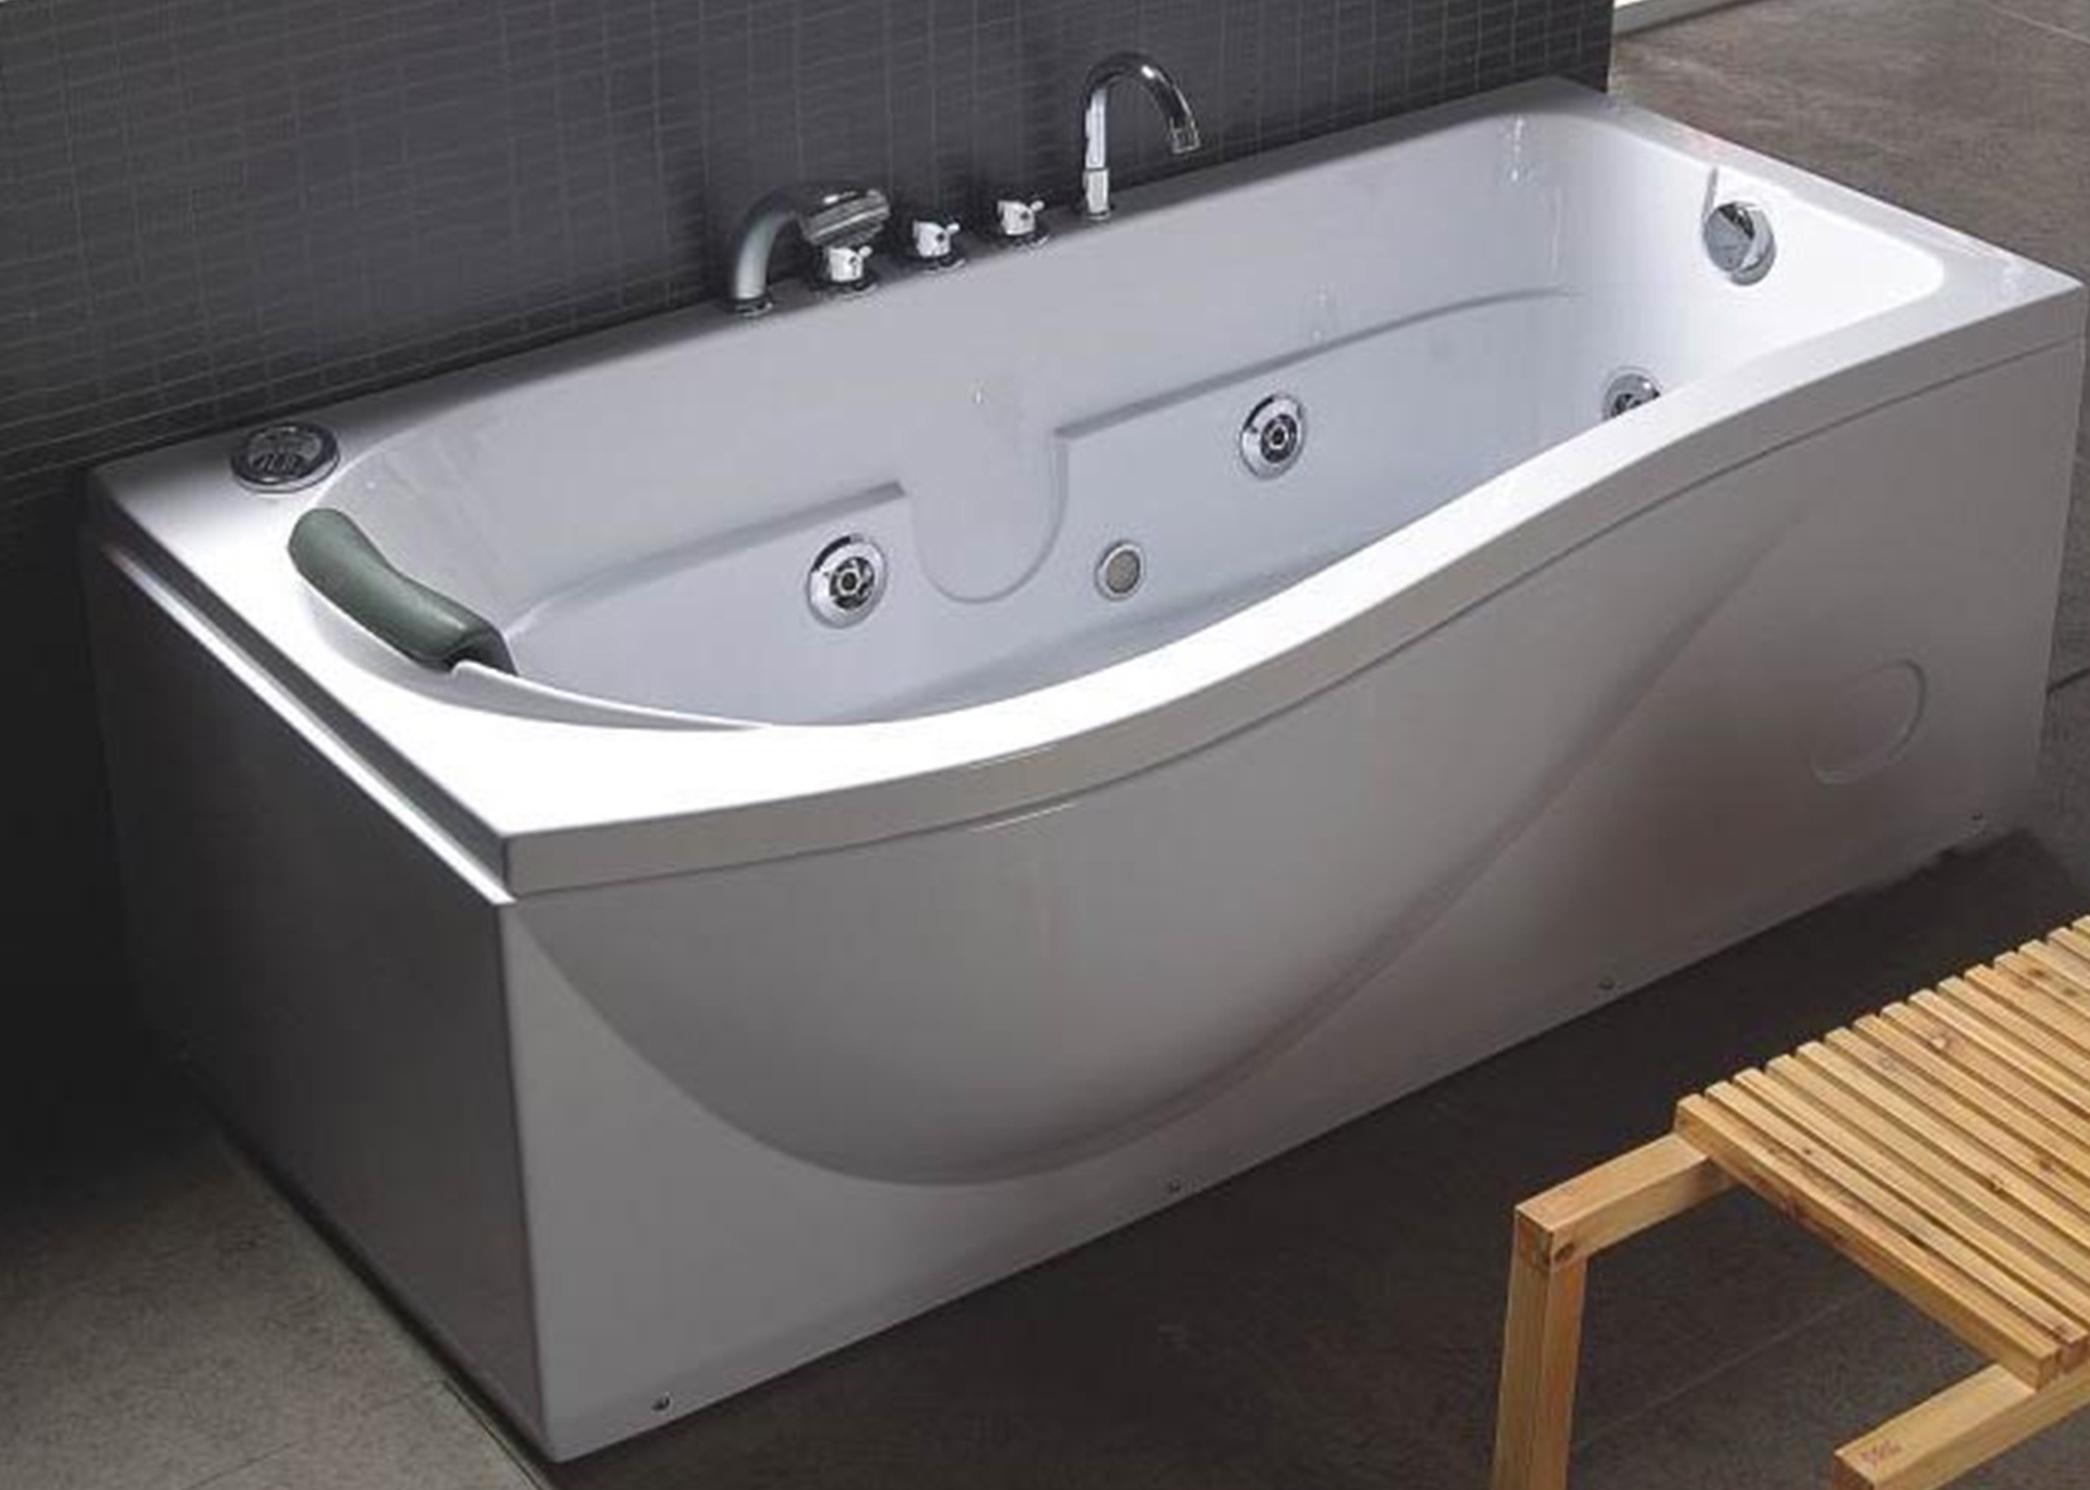 Top Rated Jetted Bathtubs Bathtub Ideas